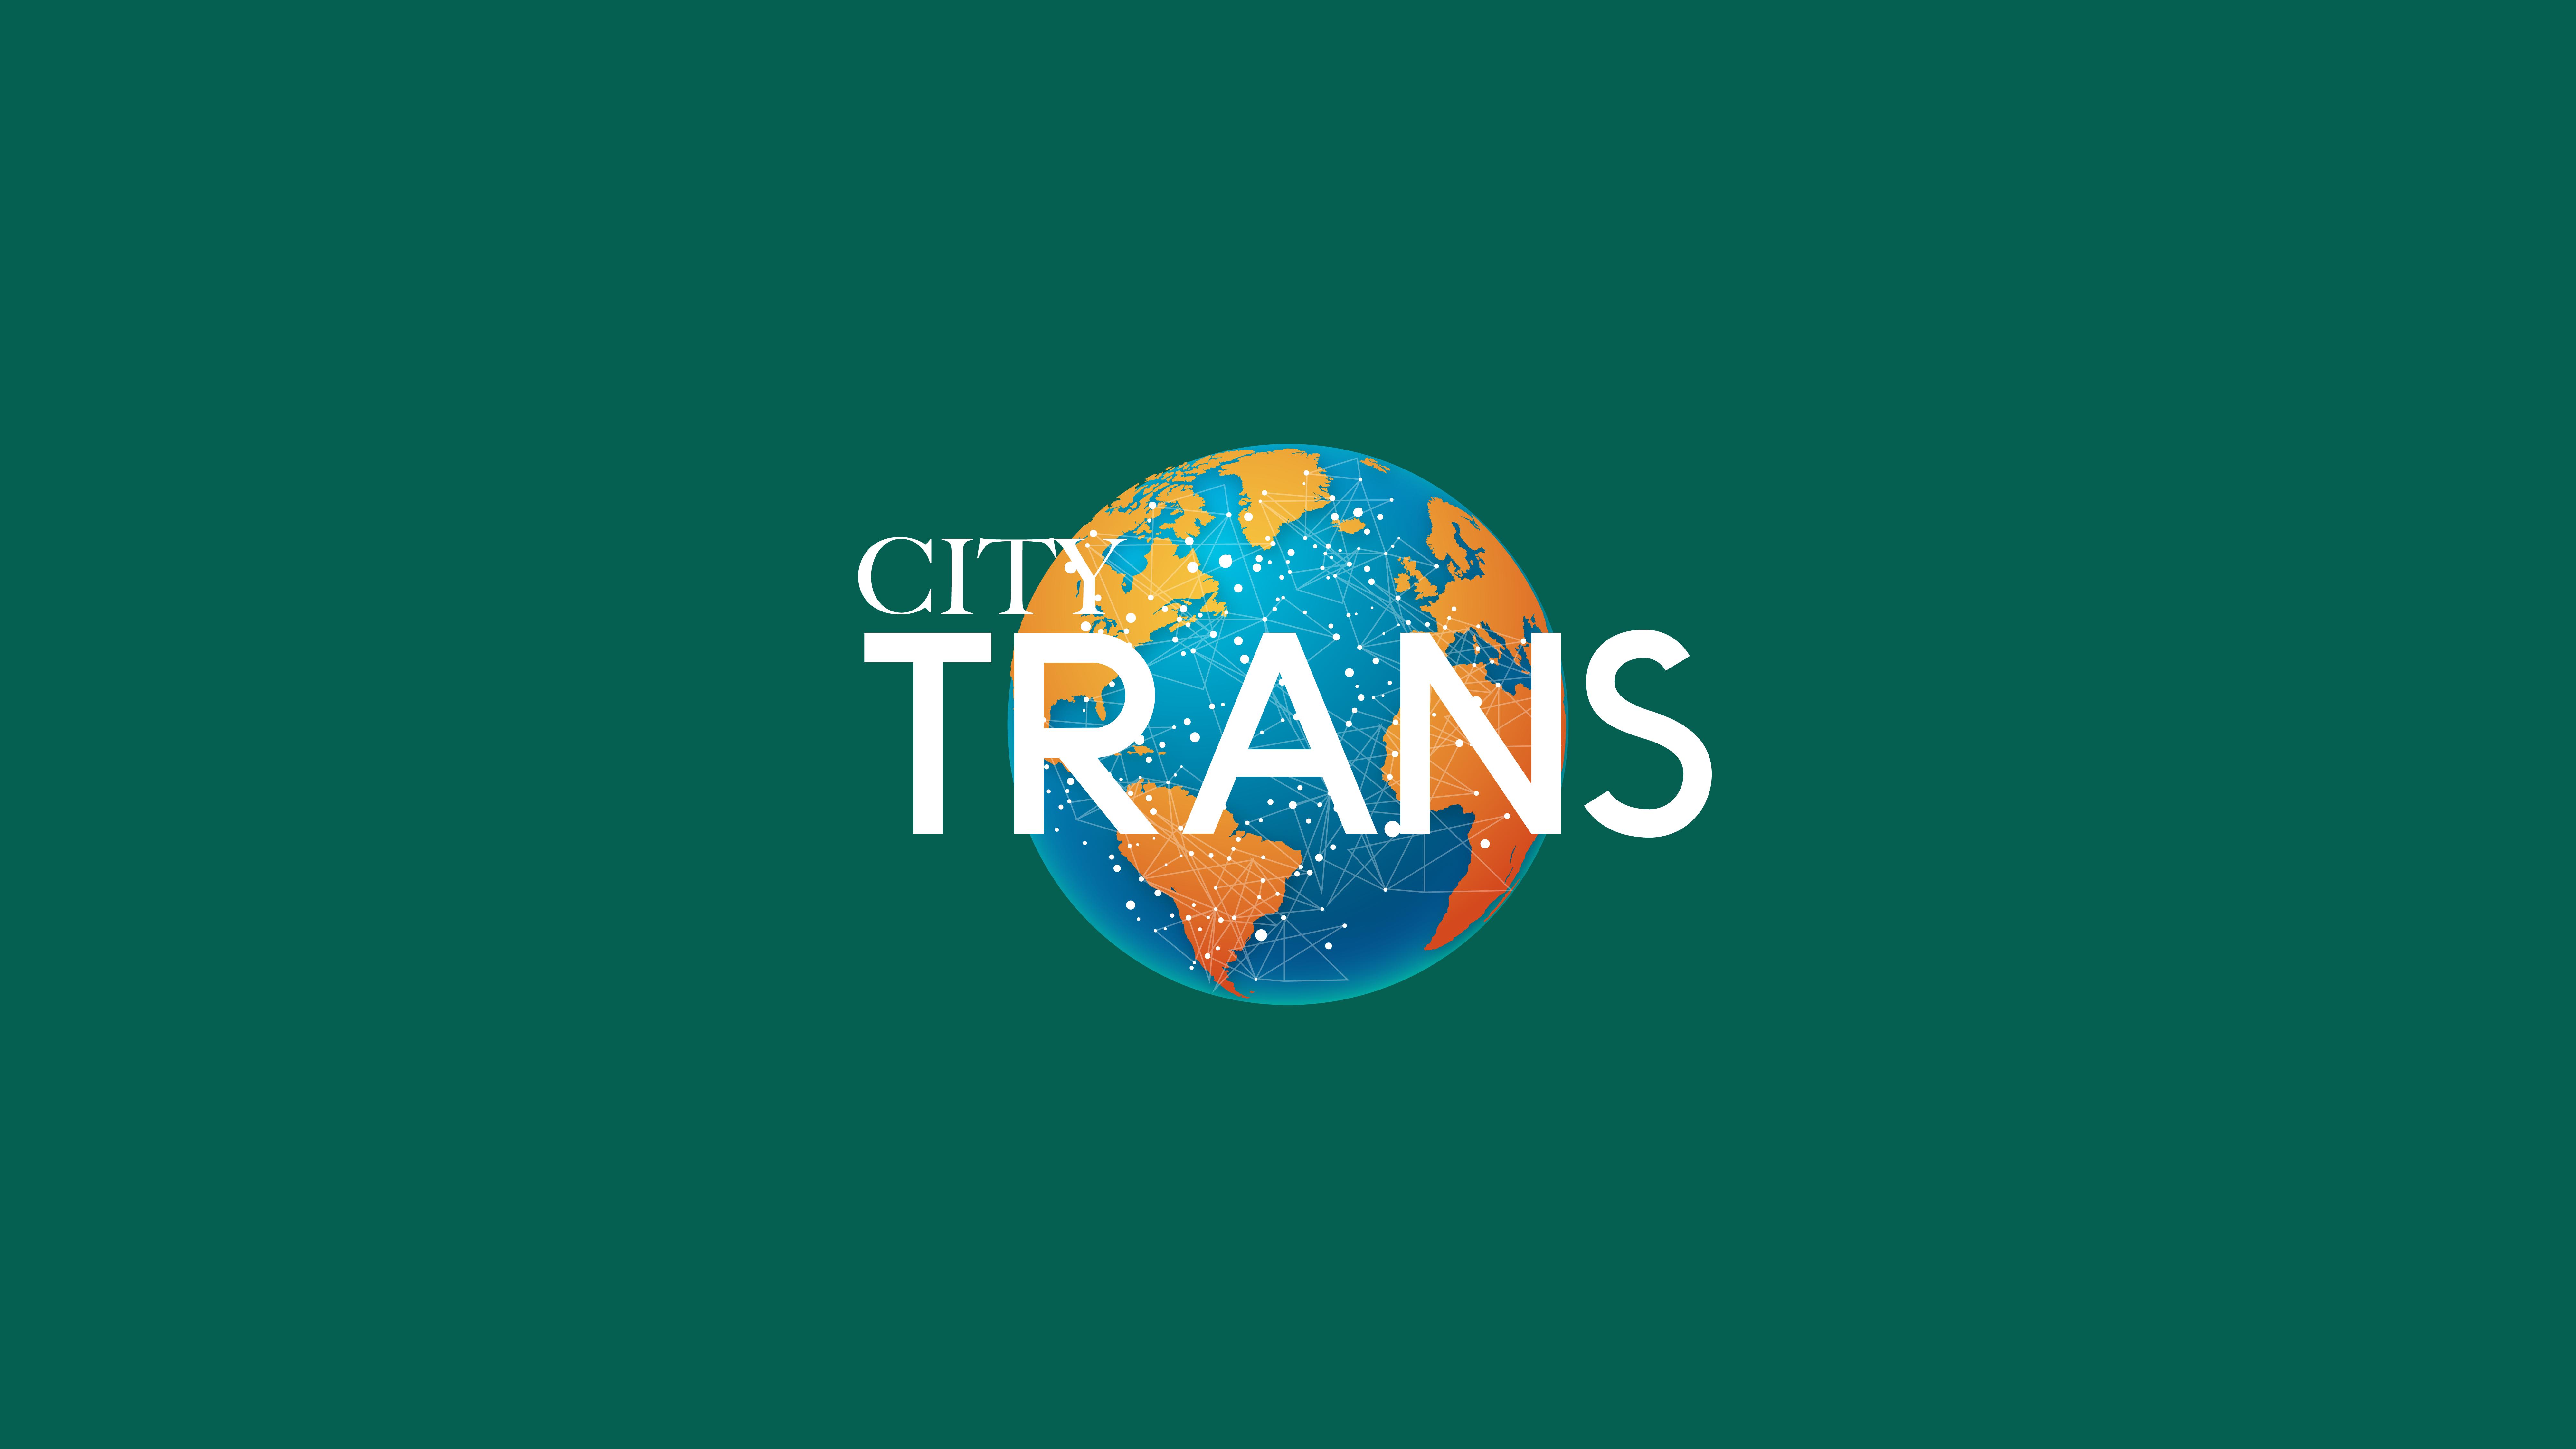 Разработка Логотипа транспортной компании фото f_1325e6e0e9ec5647.png